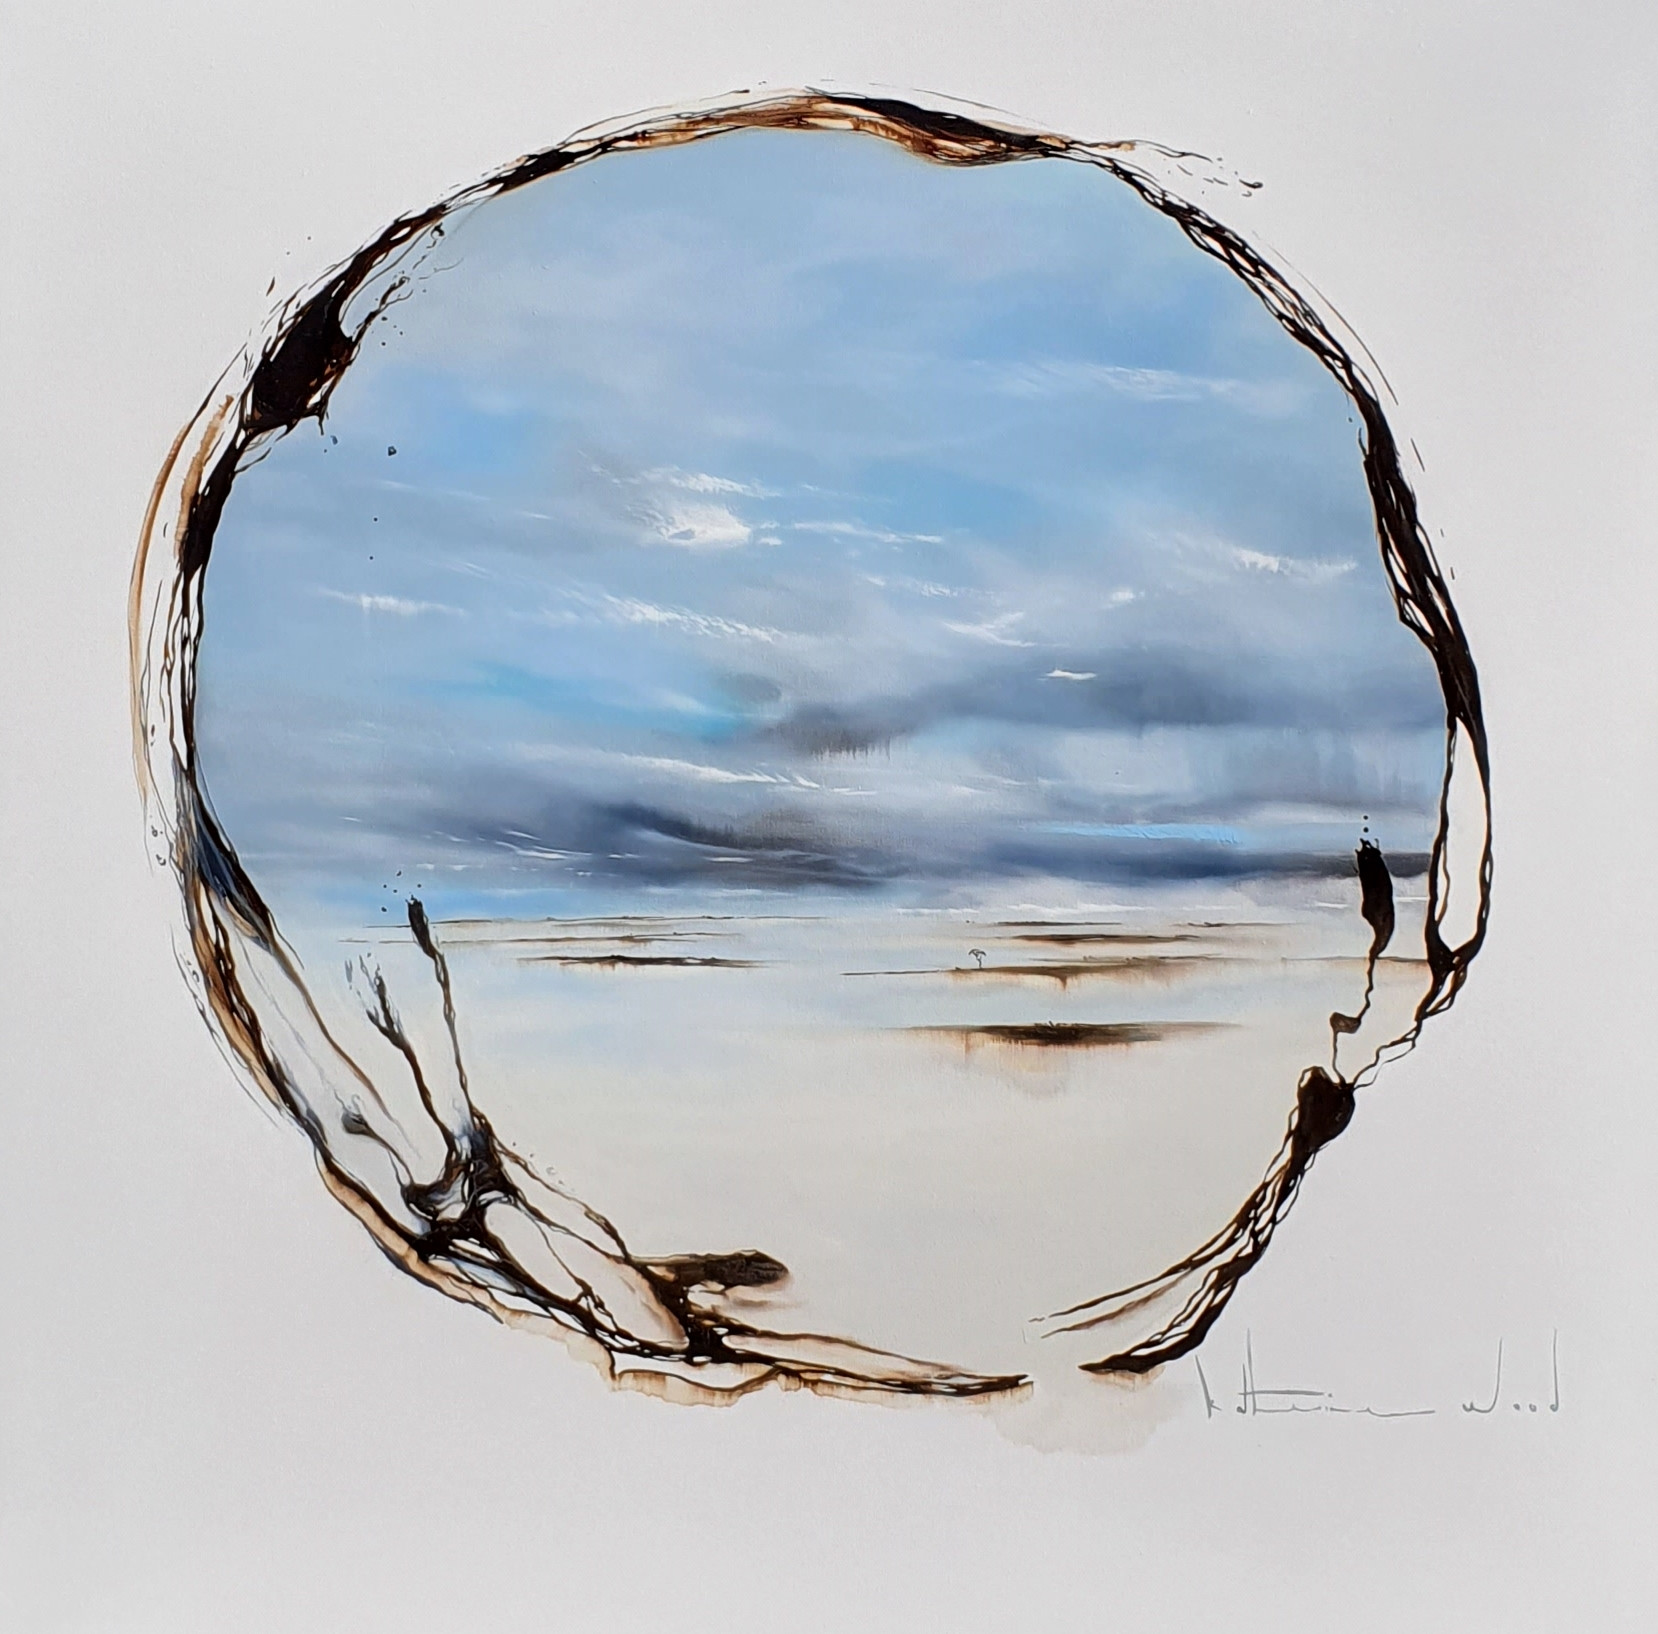 In The Stillness (Enso)